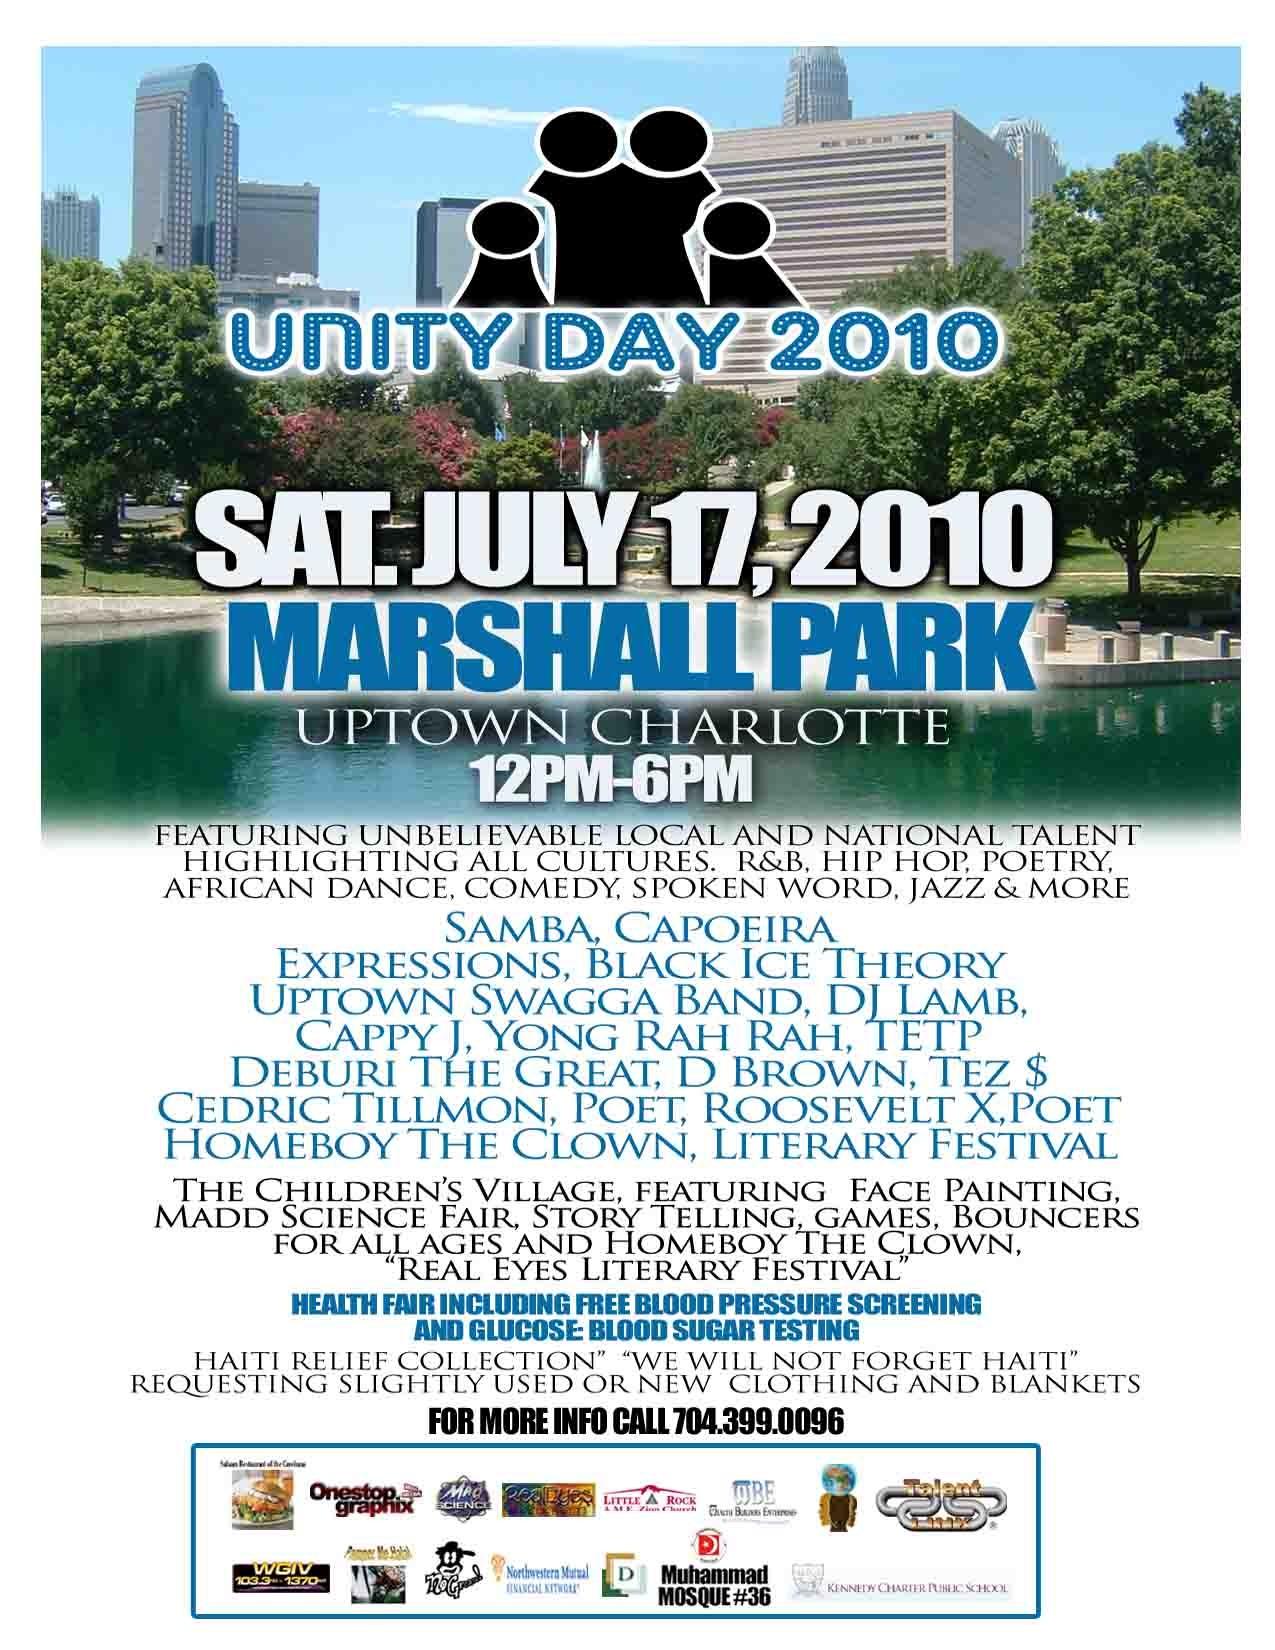 Unity Day 2010 – July 17th